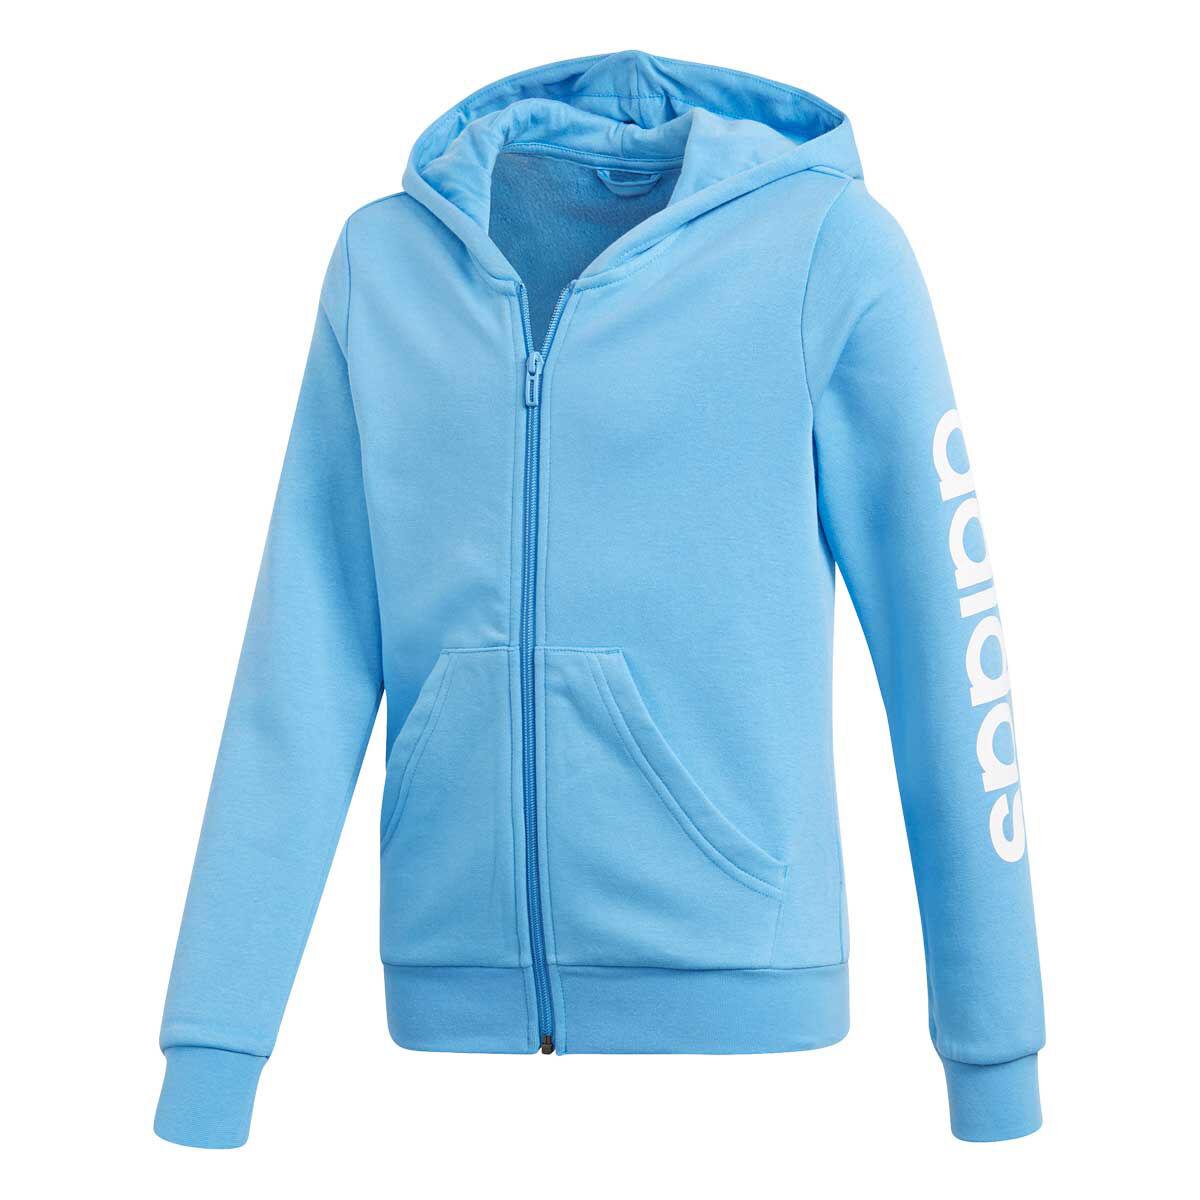 Adidas Essential Linear Full Zip Hoody Girls